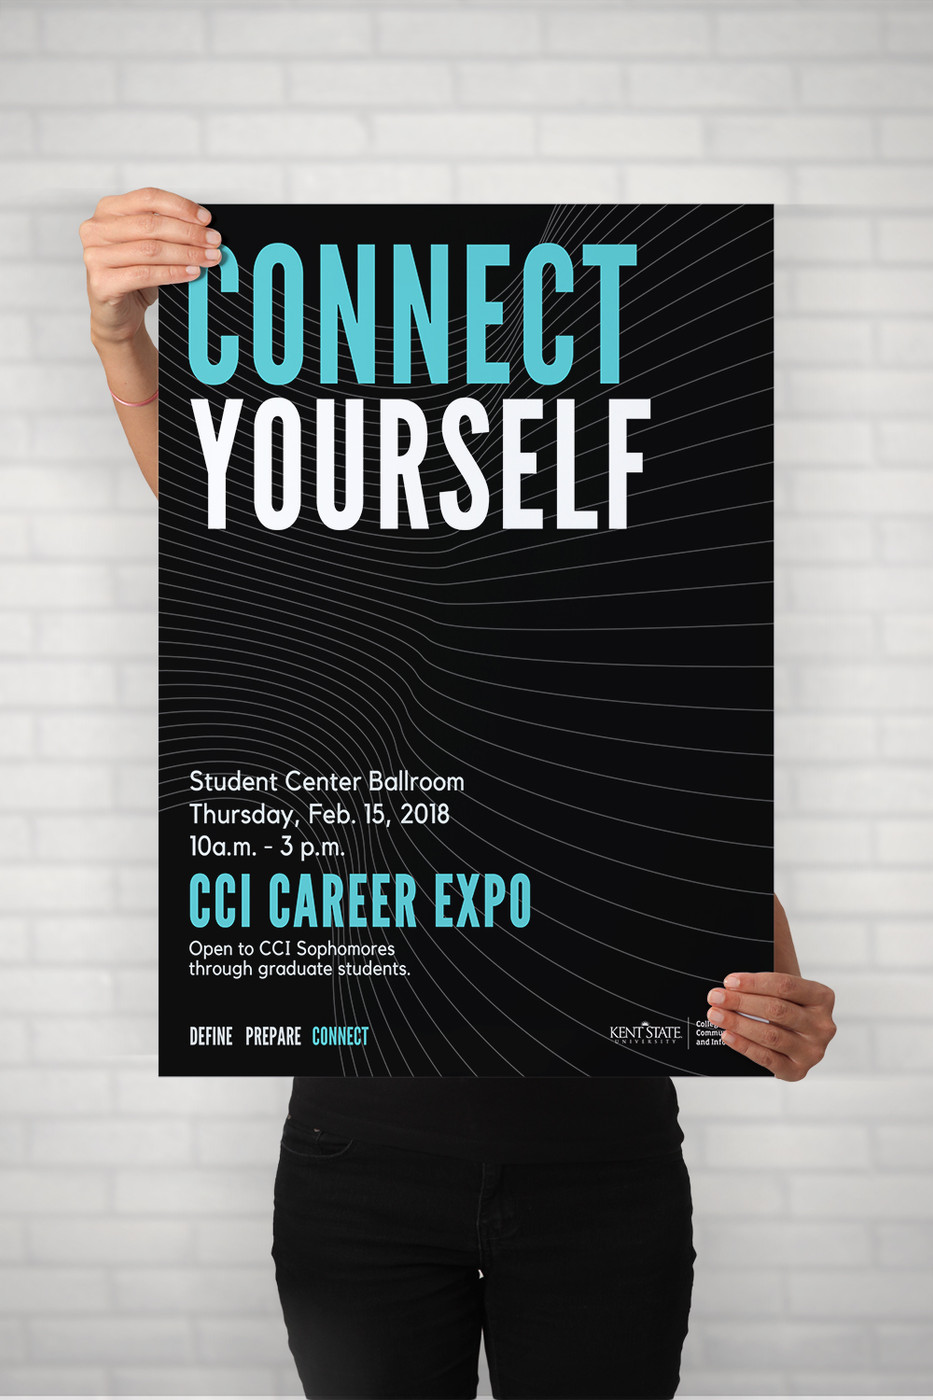 CCI Career Expo